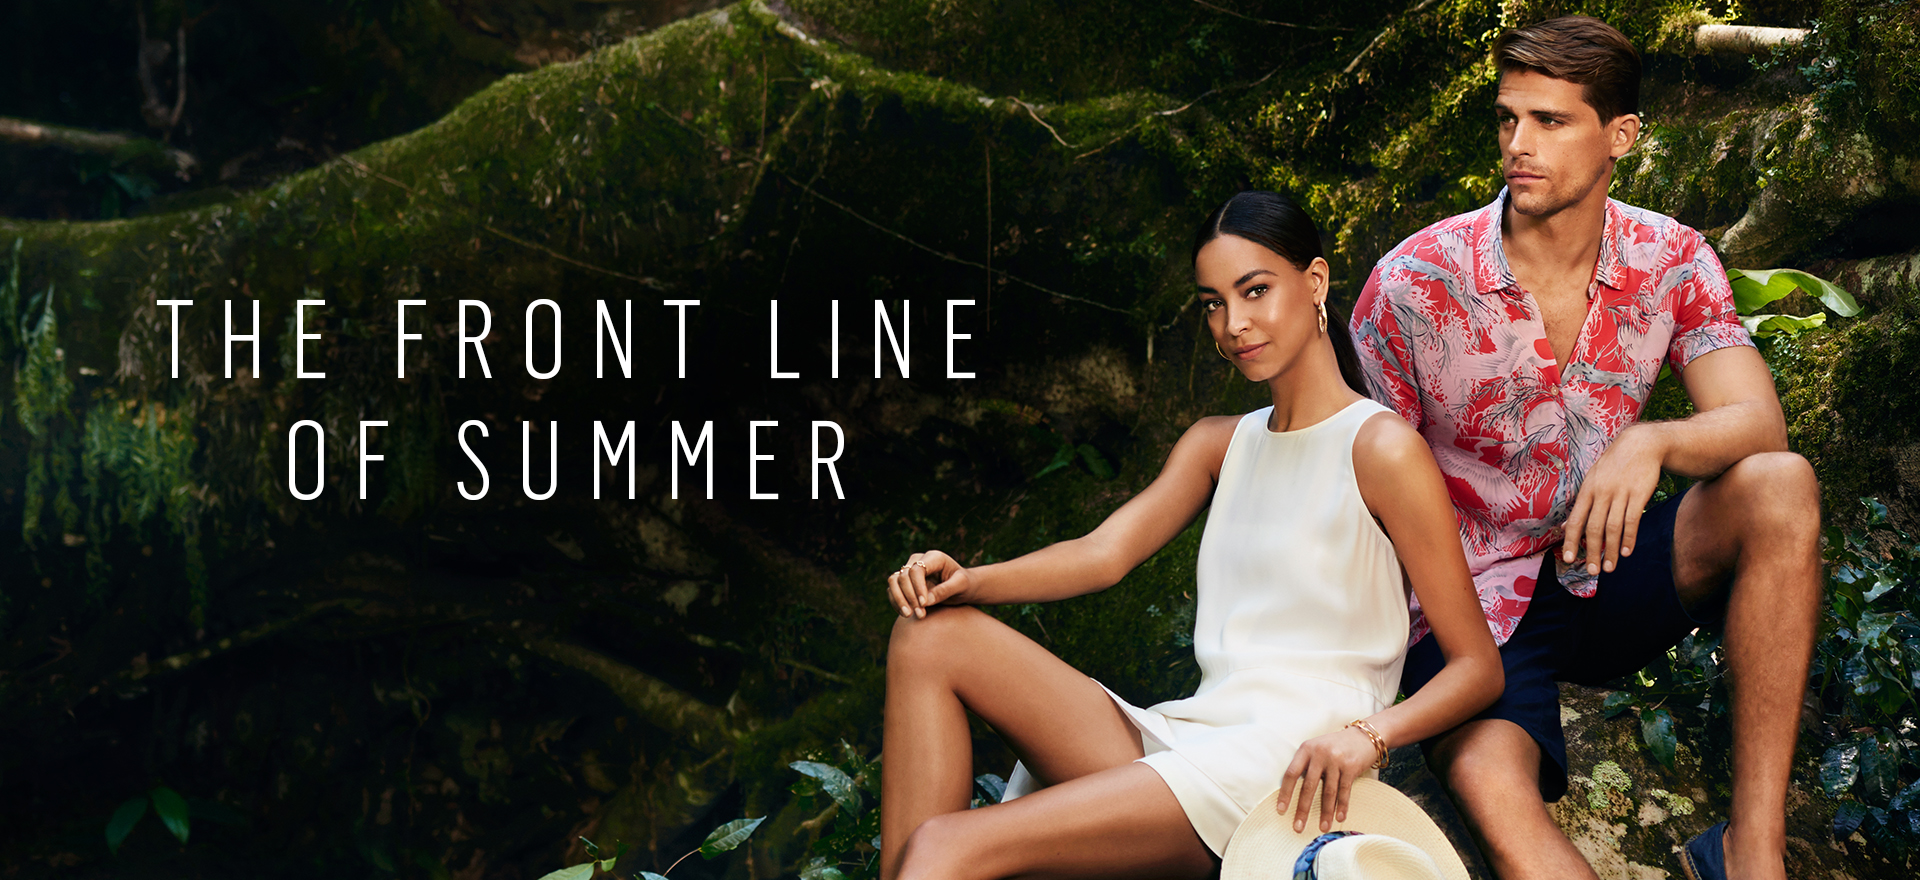 WPNM0123_70_Wayfinder_Summer Fashion Mainstream_ICONIC_1920x880.jpg